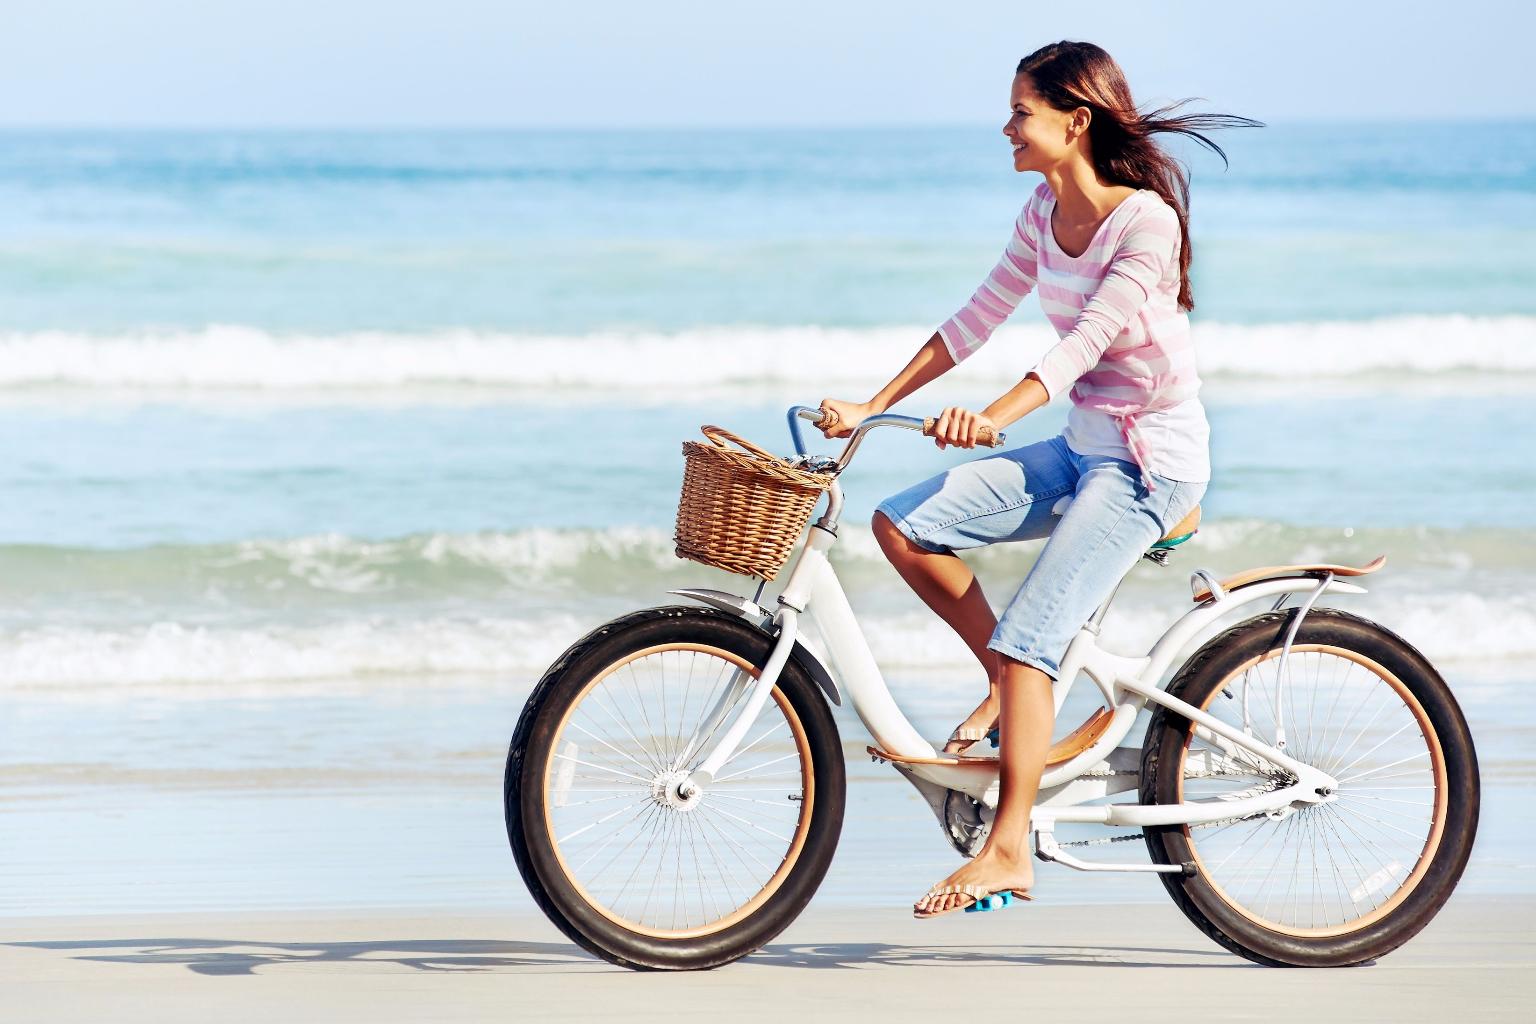 woman-on-bike-on-beach-xl1